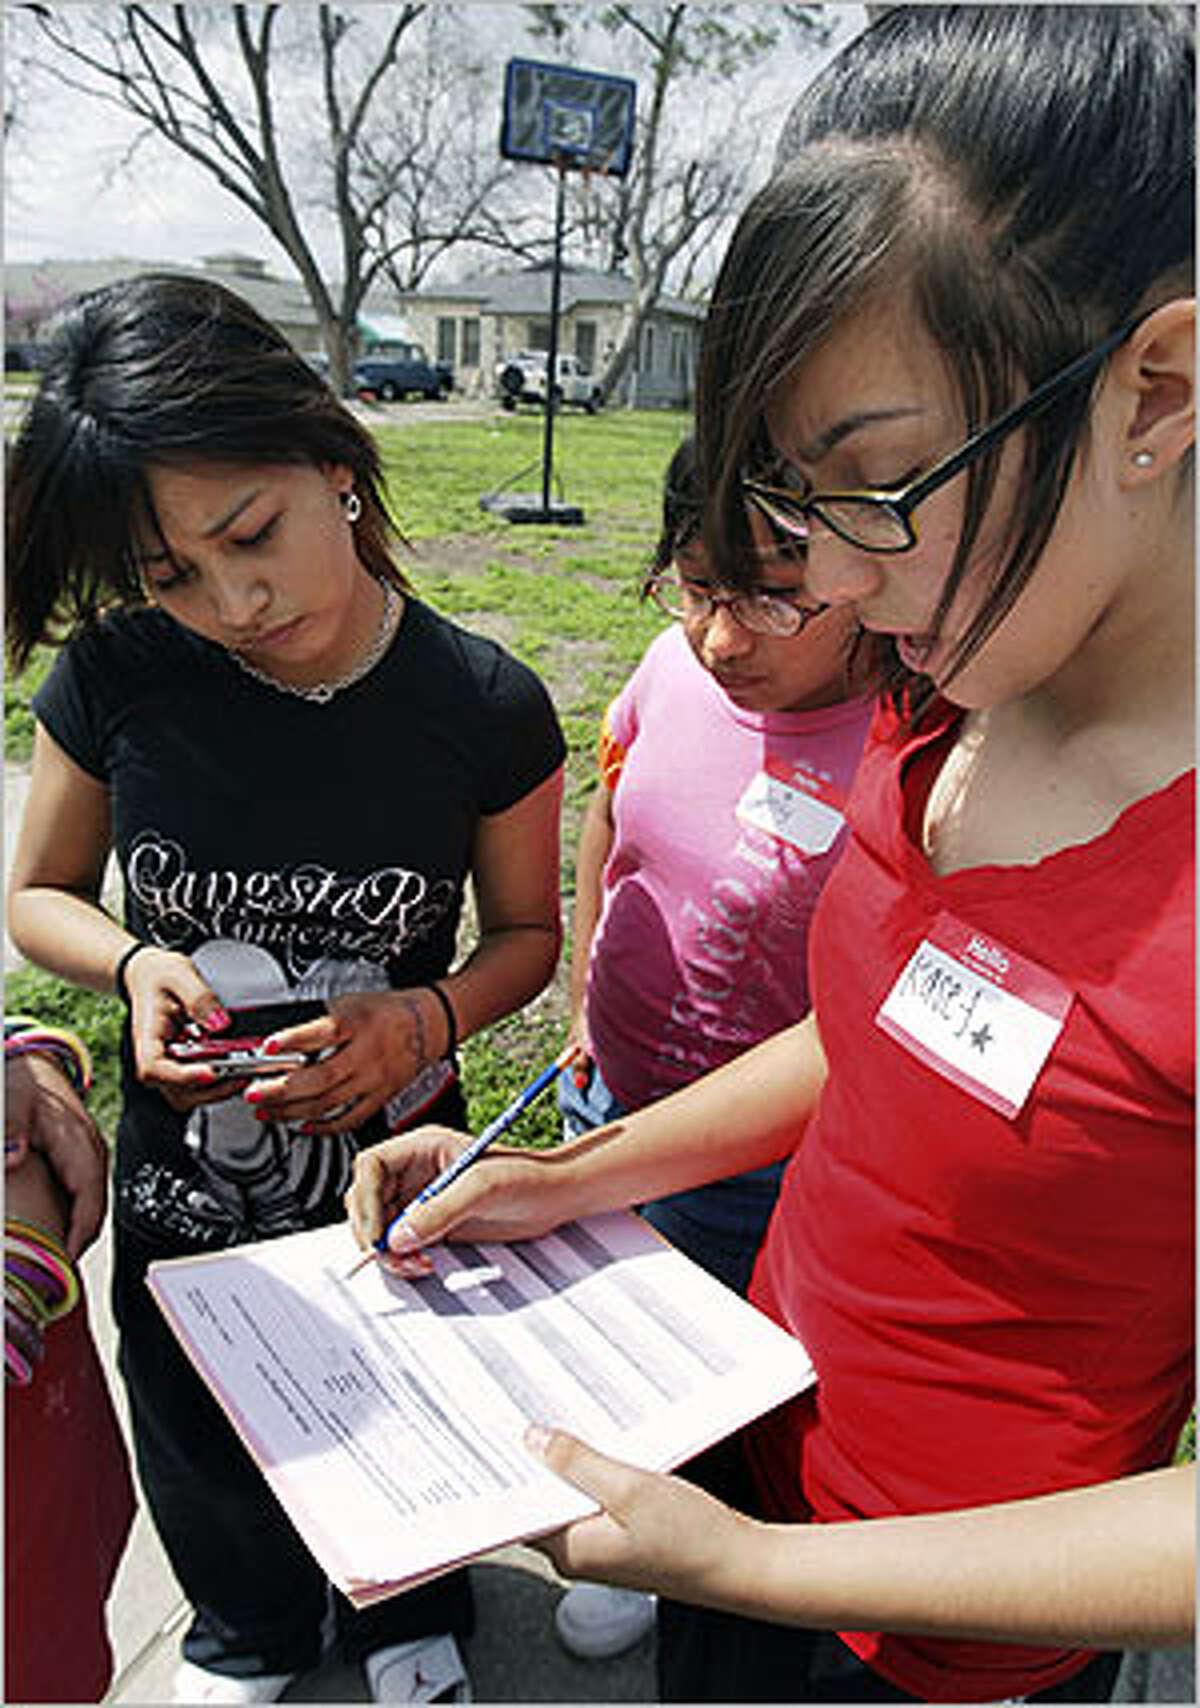 Emily Sanchez (center) watches Cassandra Delgado record data about the photograph of a basketball goal taken by Michelle Luis (left).